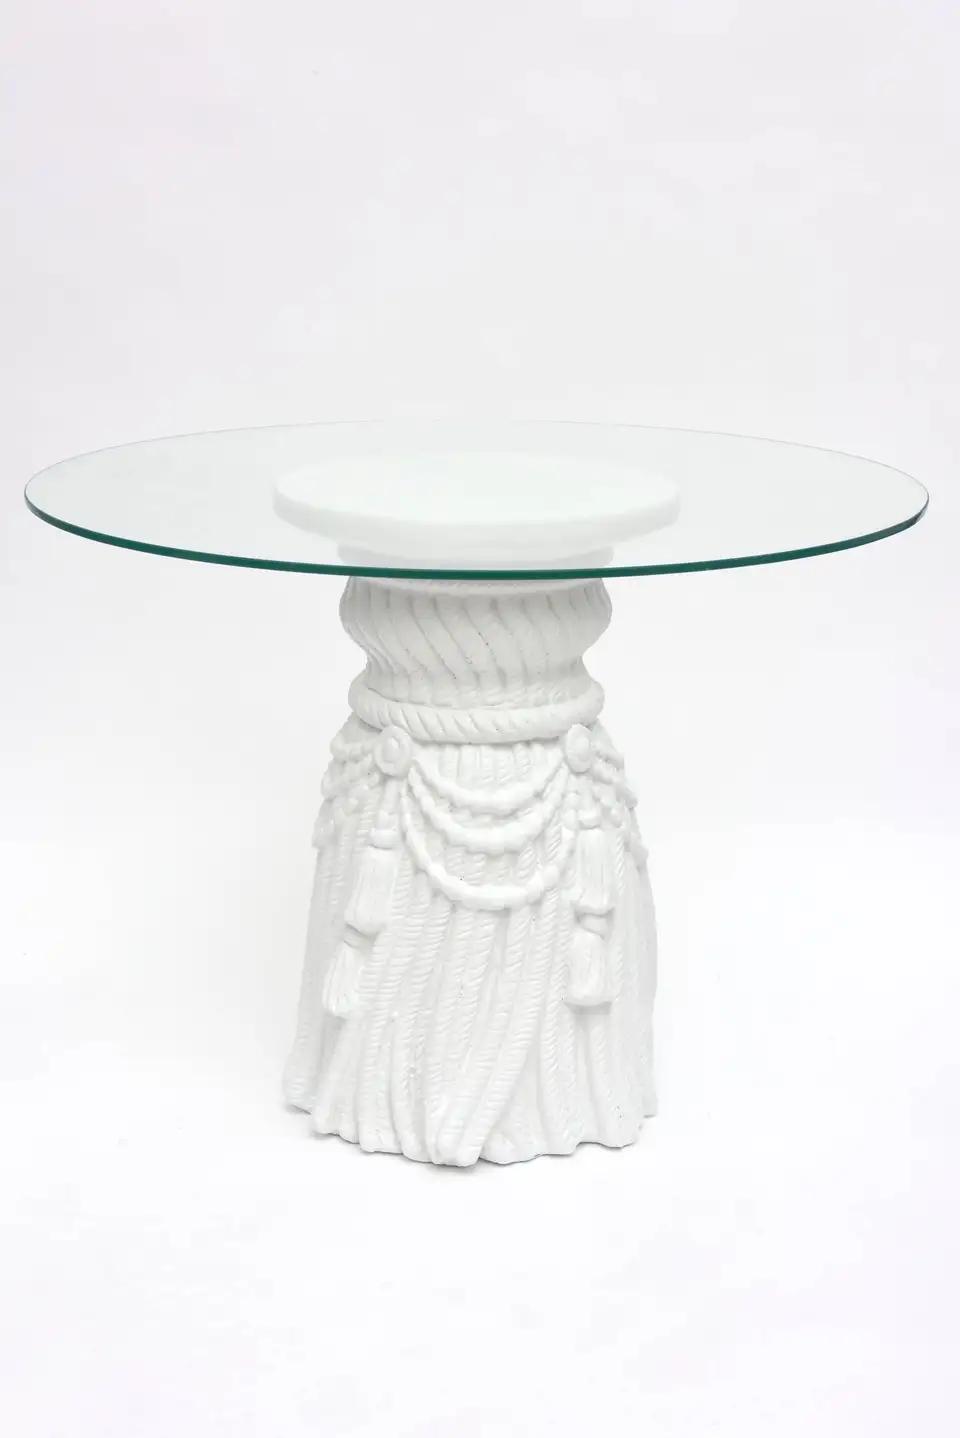 Plaster Of Paris White Draped Sculptural Side Tables John Dickinson Style Side Table Sculpture Plaster Of Paris [ 1438 x 960 Pixel ]